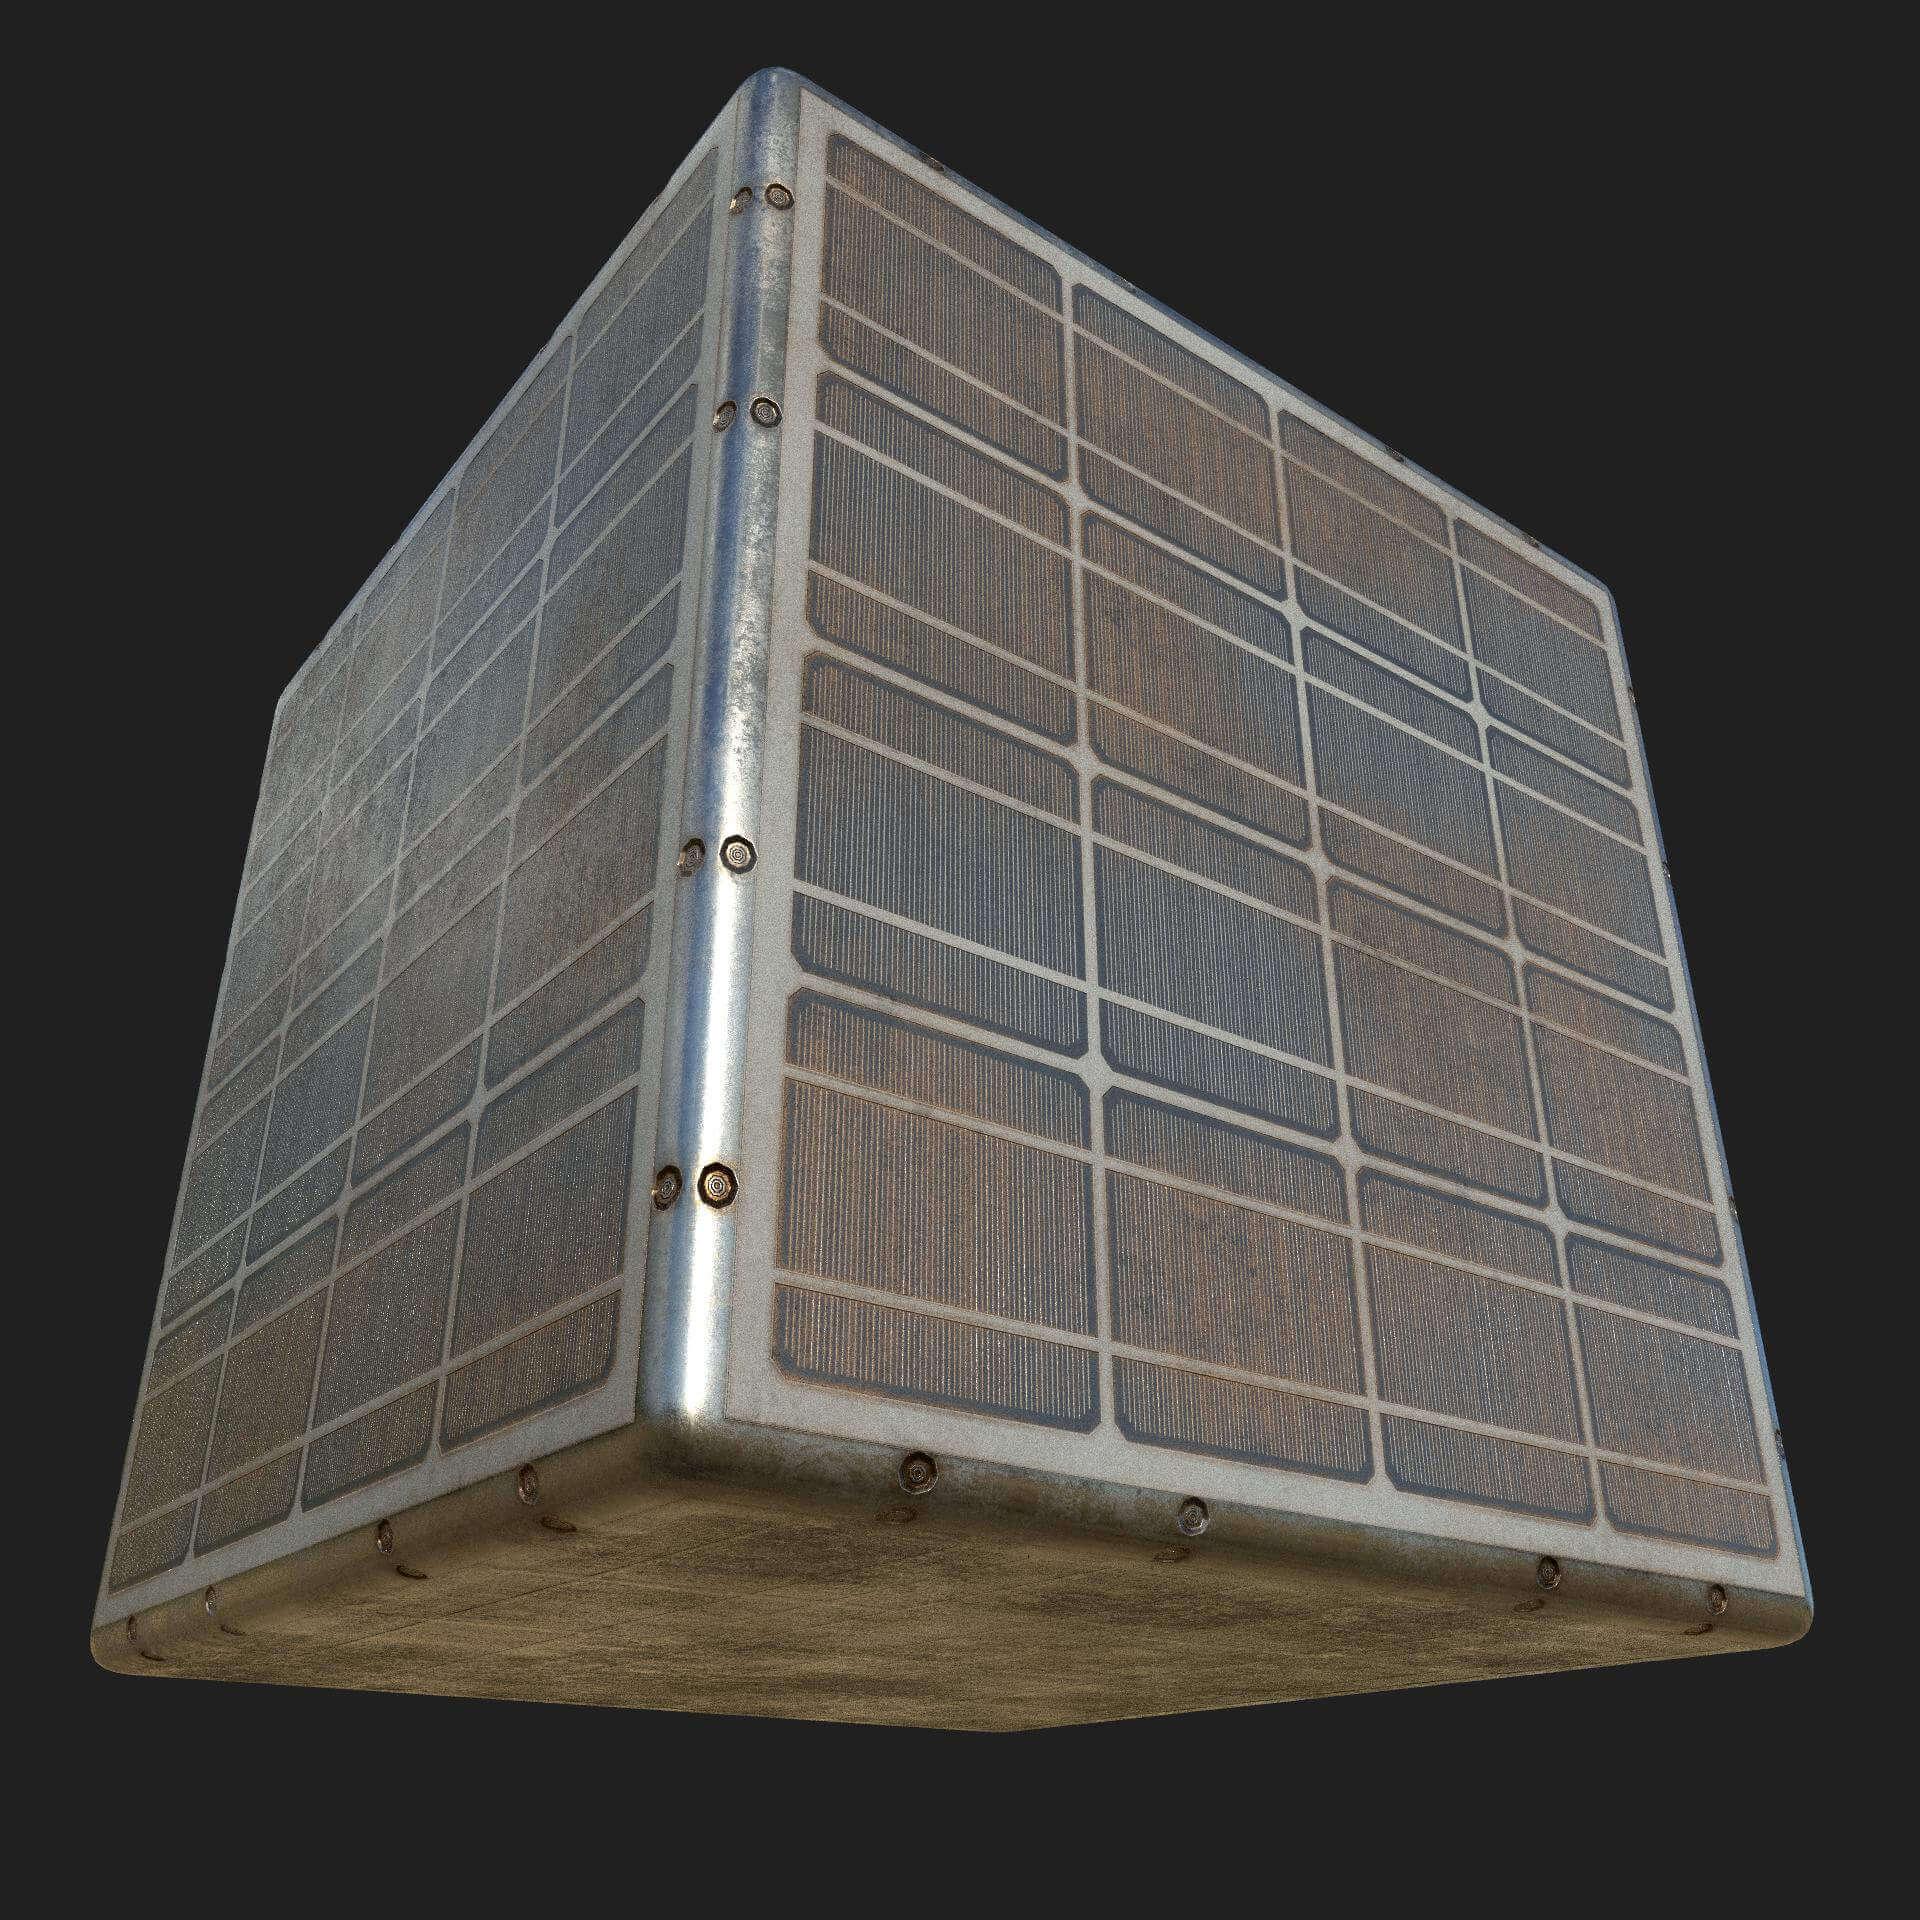 Old Solar Panels Seamless Texture